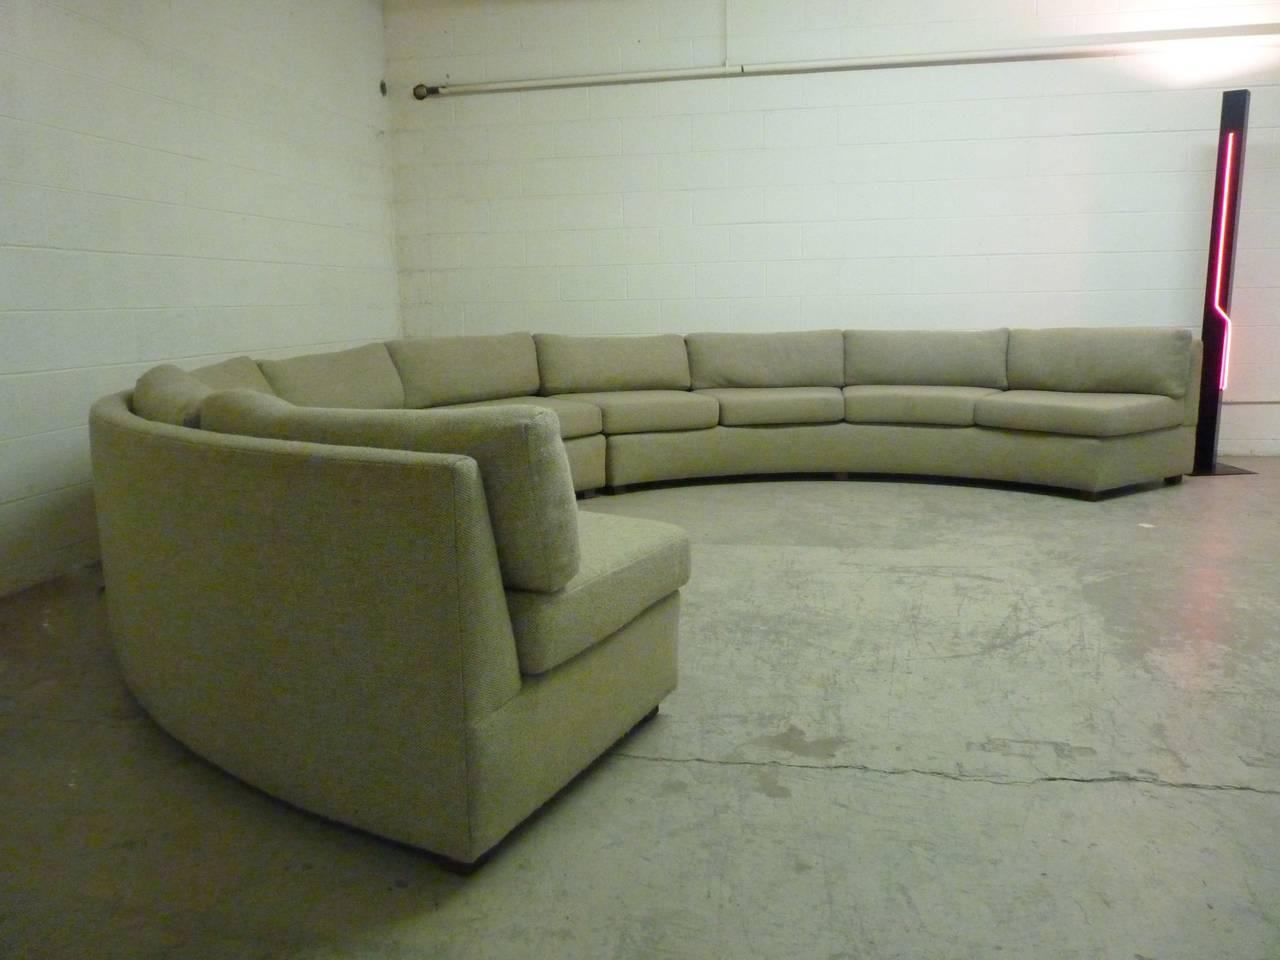 Large Curved Milo Baughman Sectional Sofa At 1stdibs